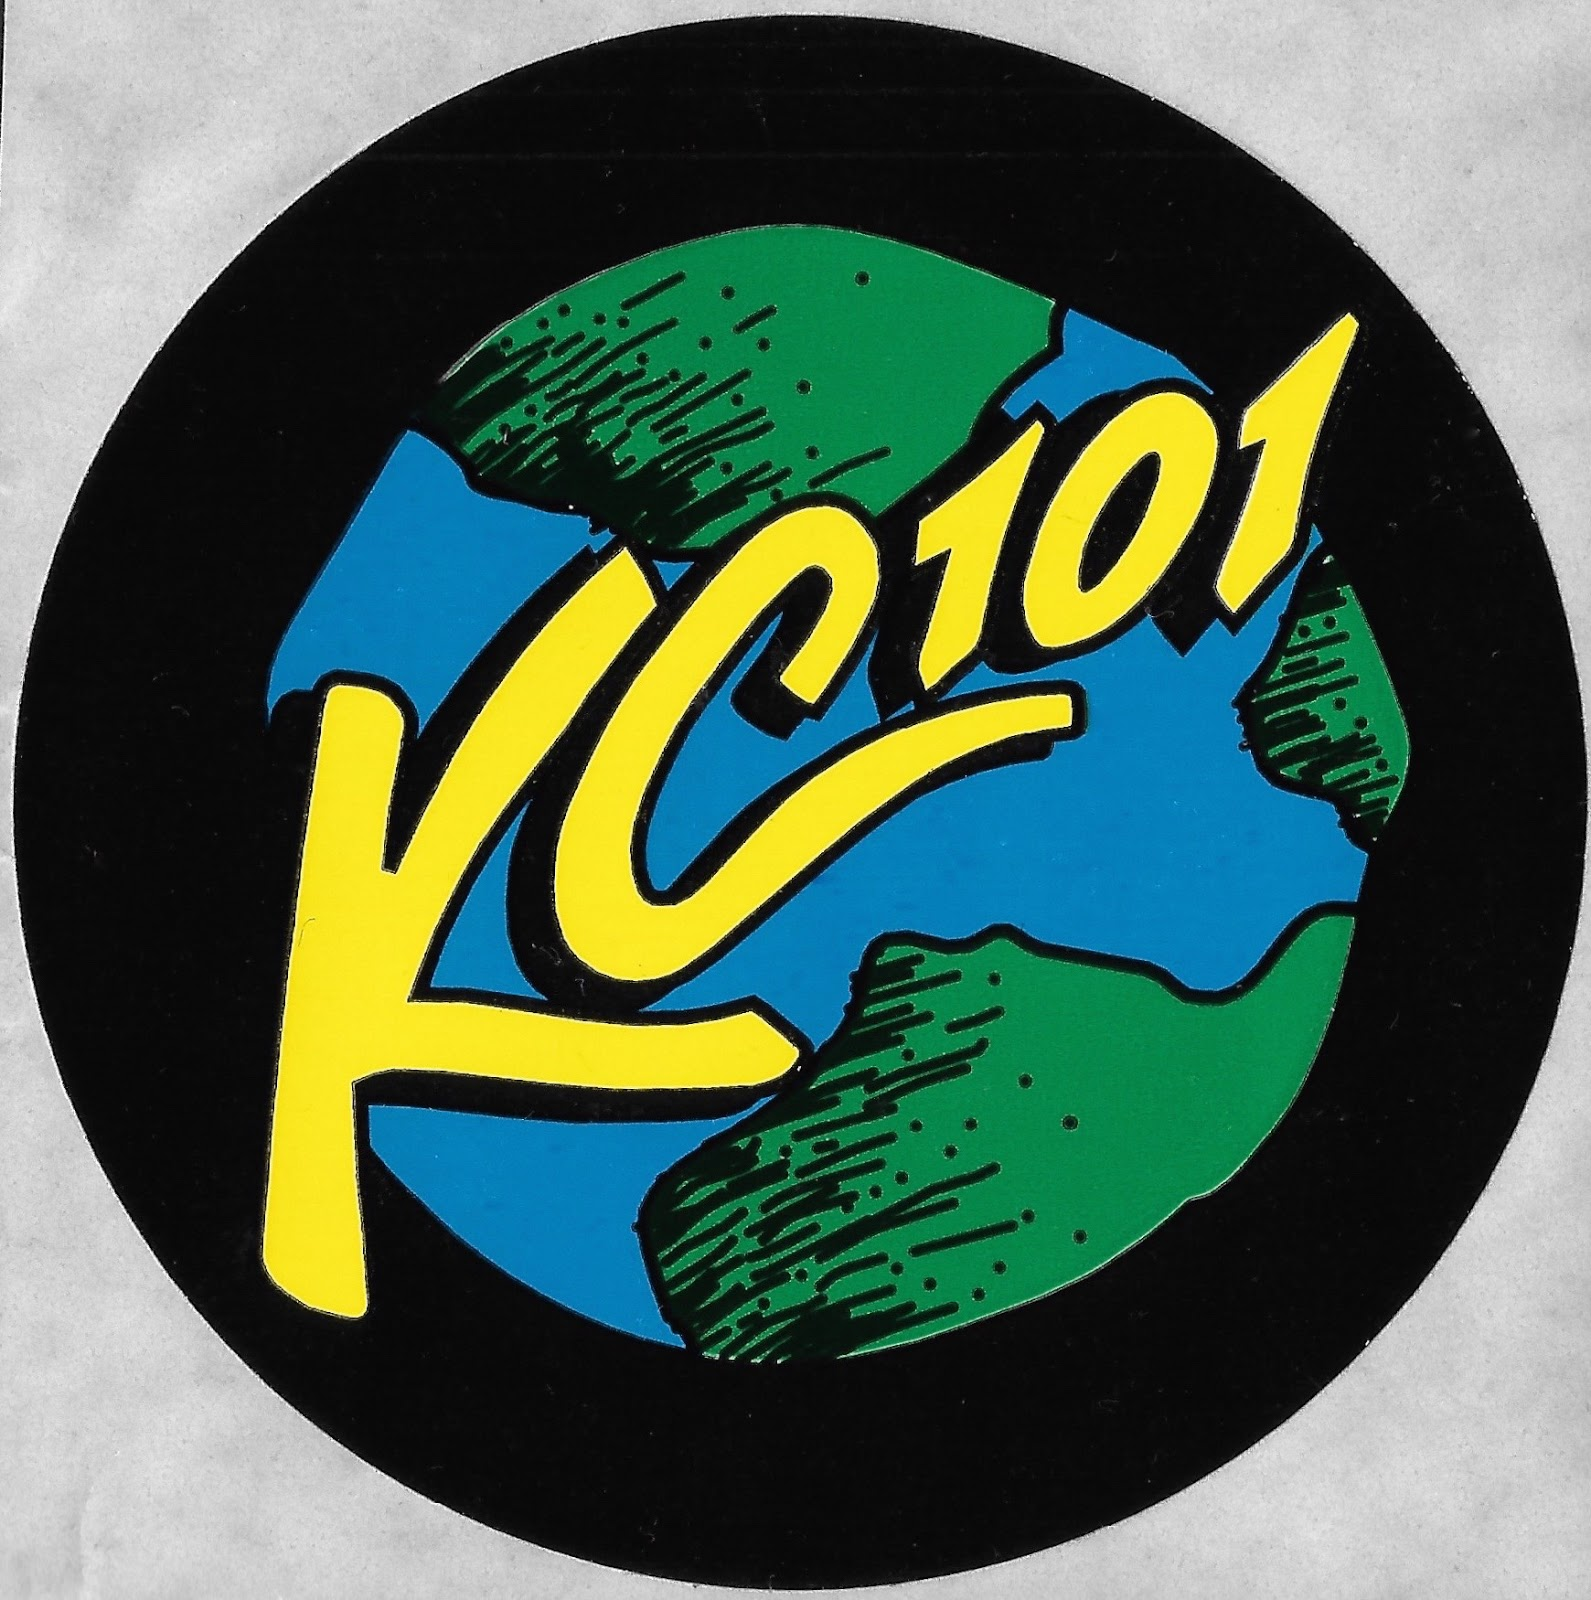 WKCI-FM